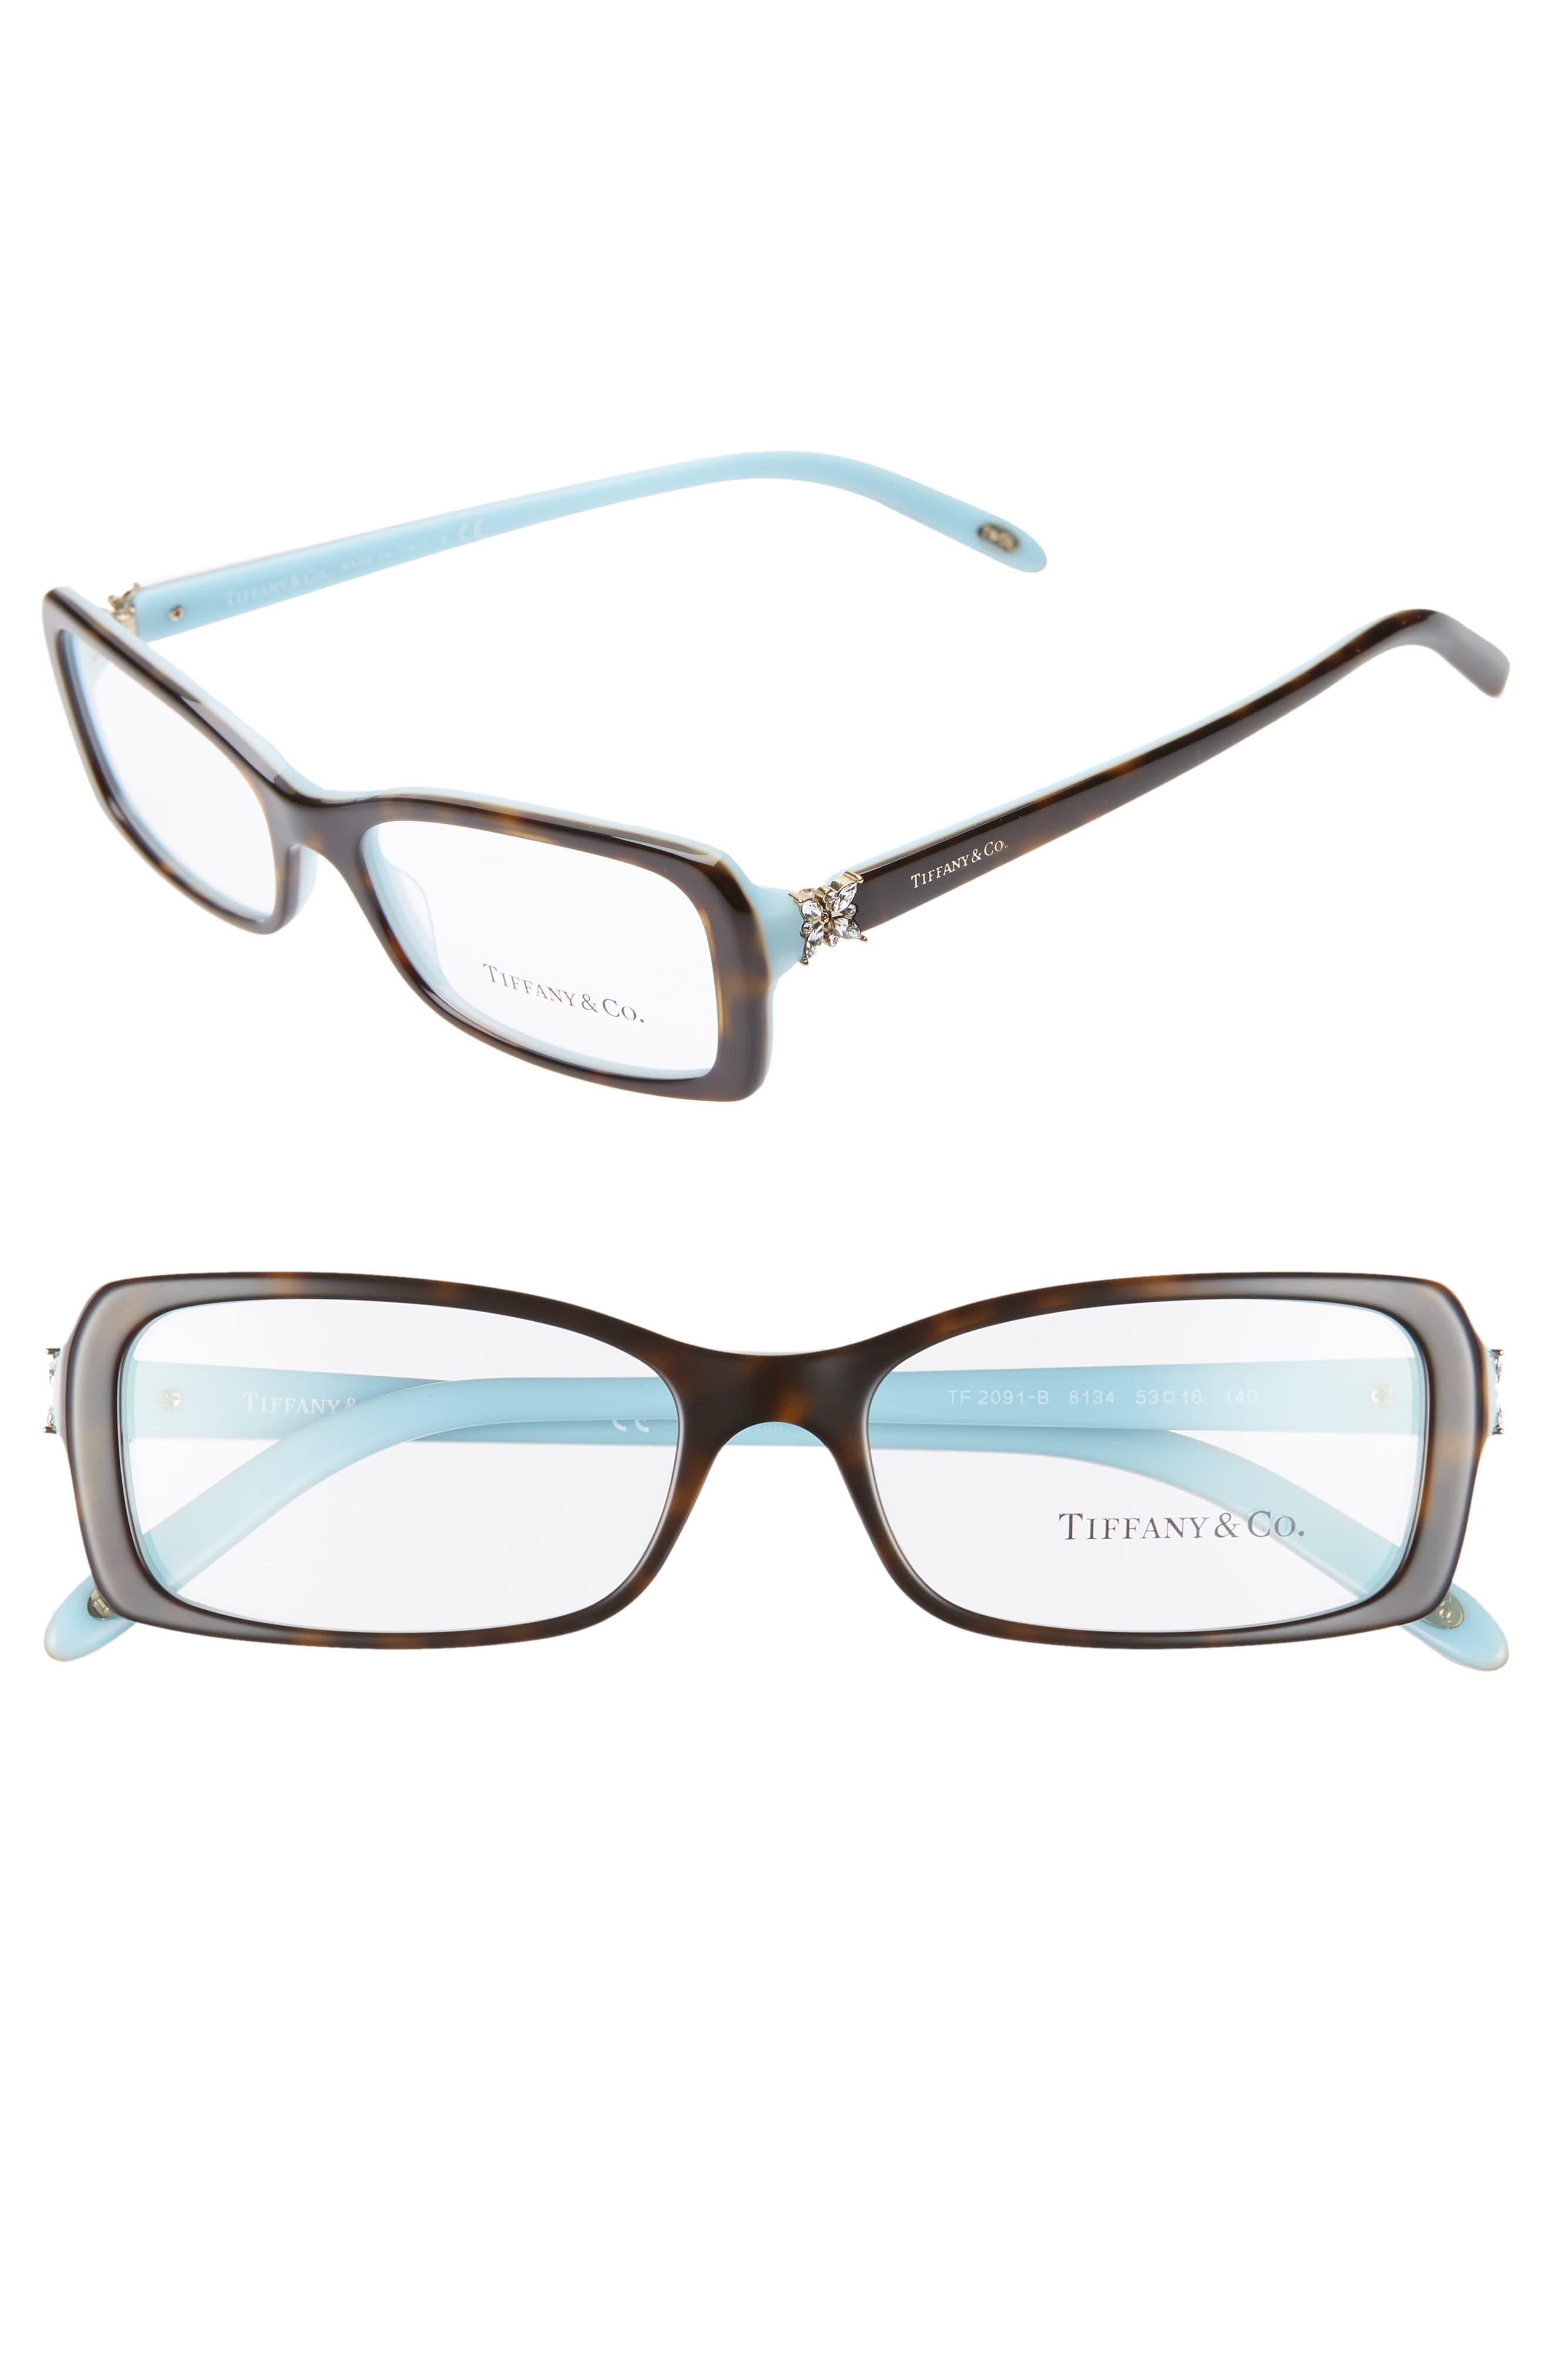 11954b4ba5b6 Tiffany & Co. 53mm Optical Glasses - Top Havana/ Blue in Blue - Lyst